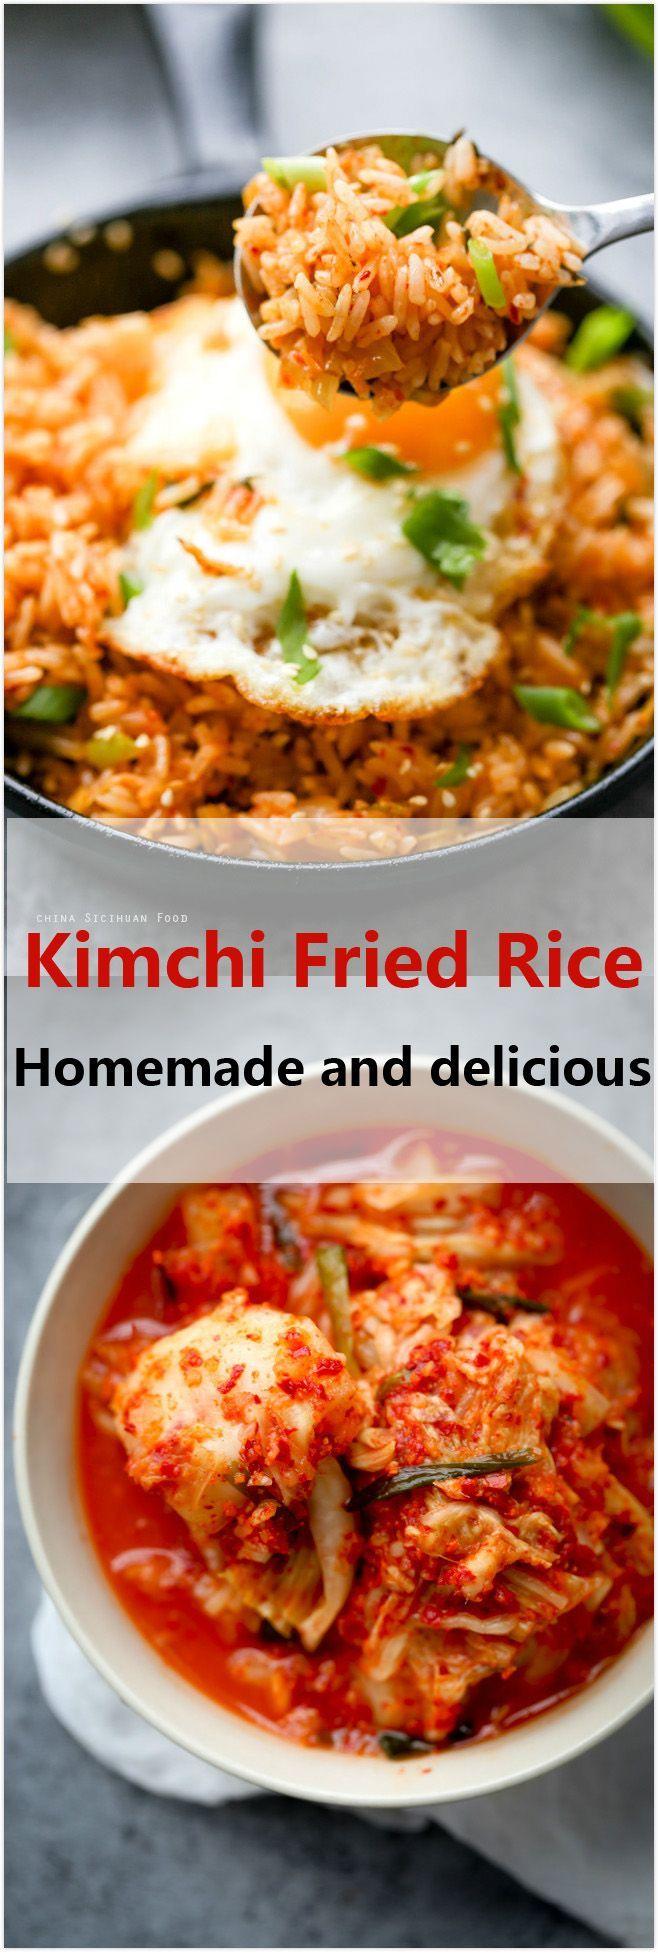 67 best Food-Korean images on Pinterest